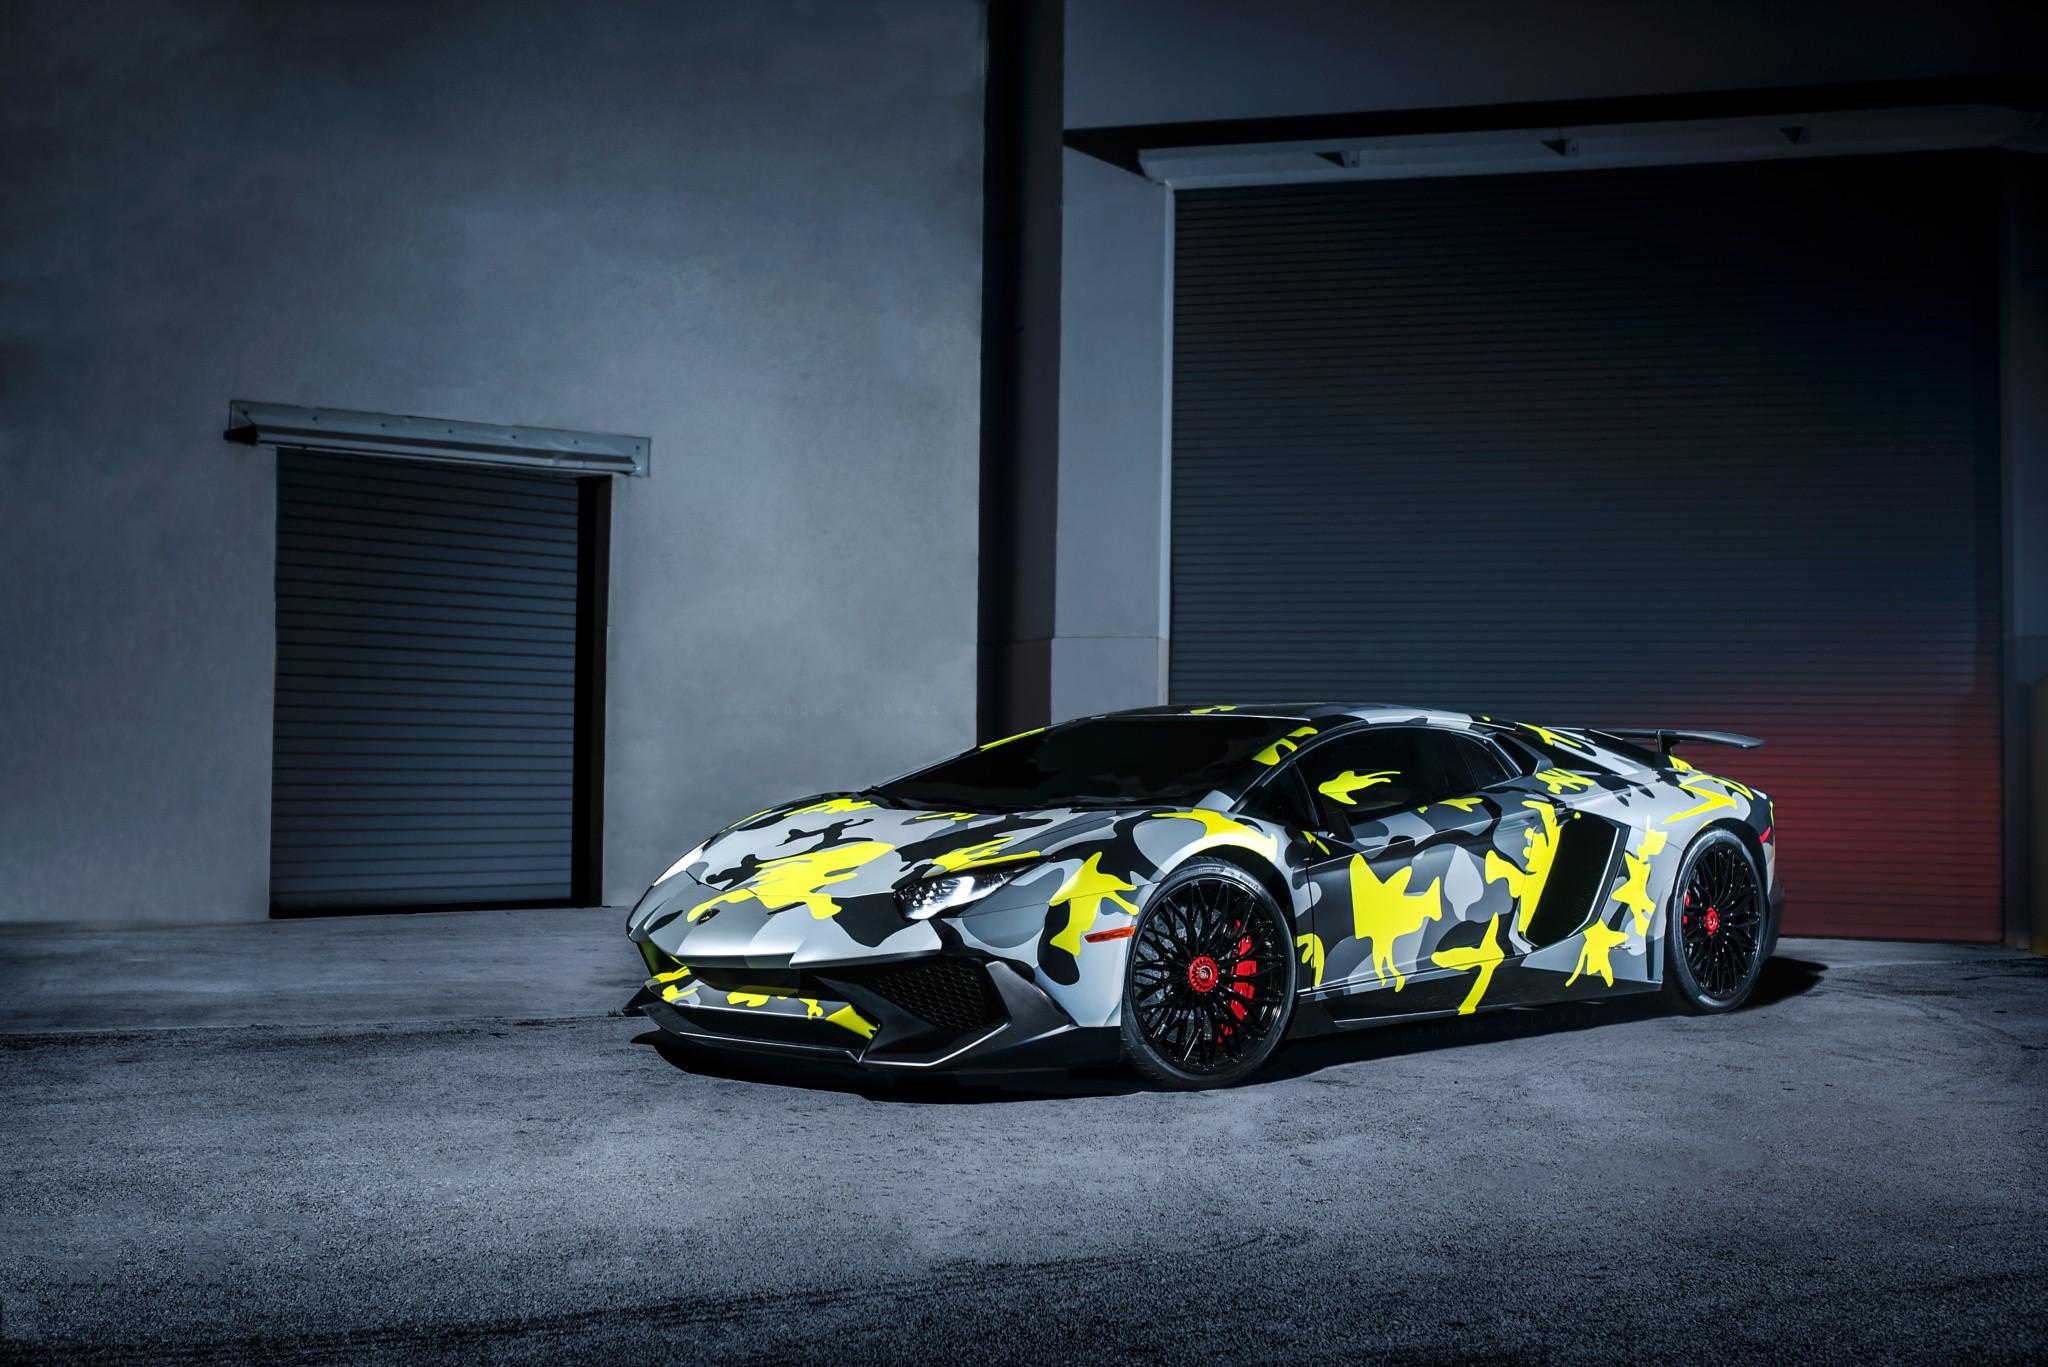 Lamborghini Aventador Modified Hd Cars 4k Wallpapers Images